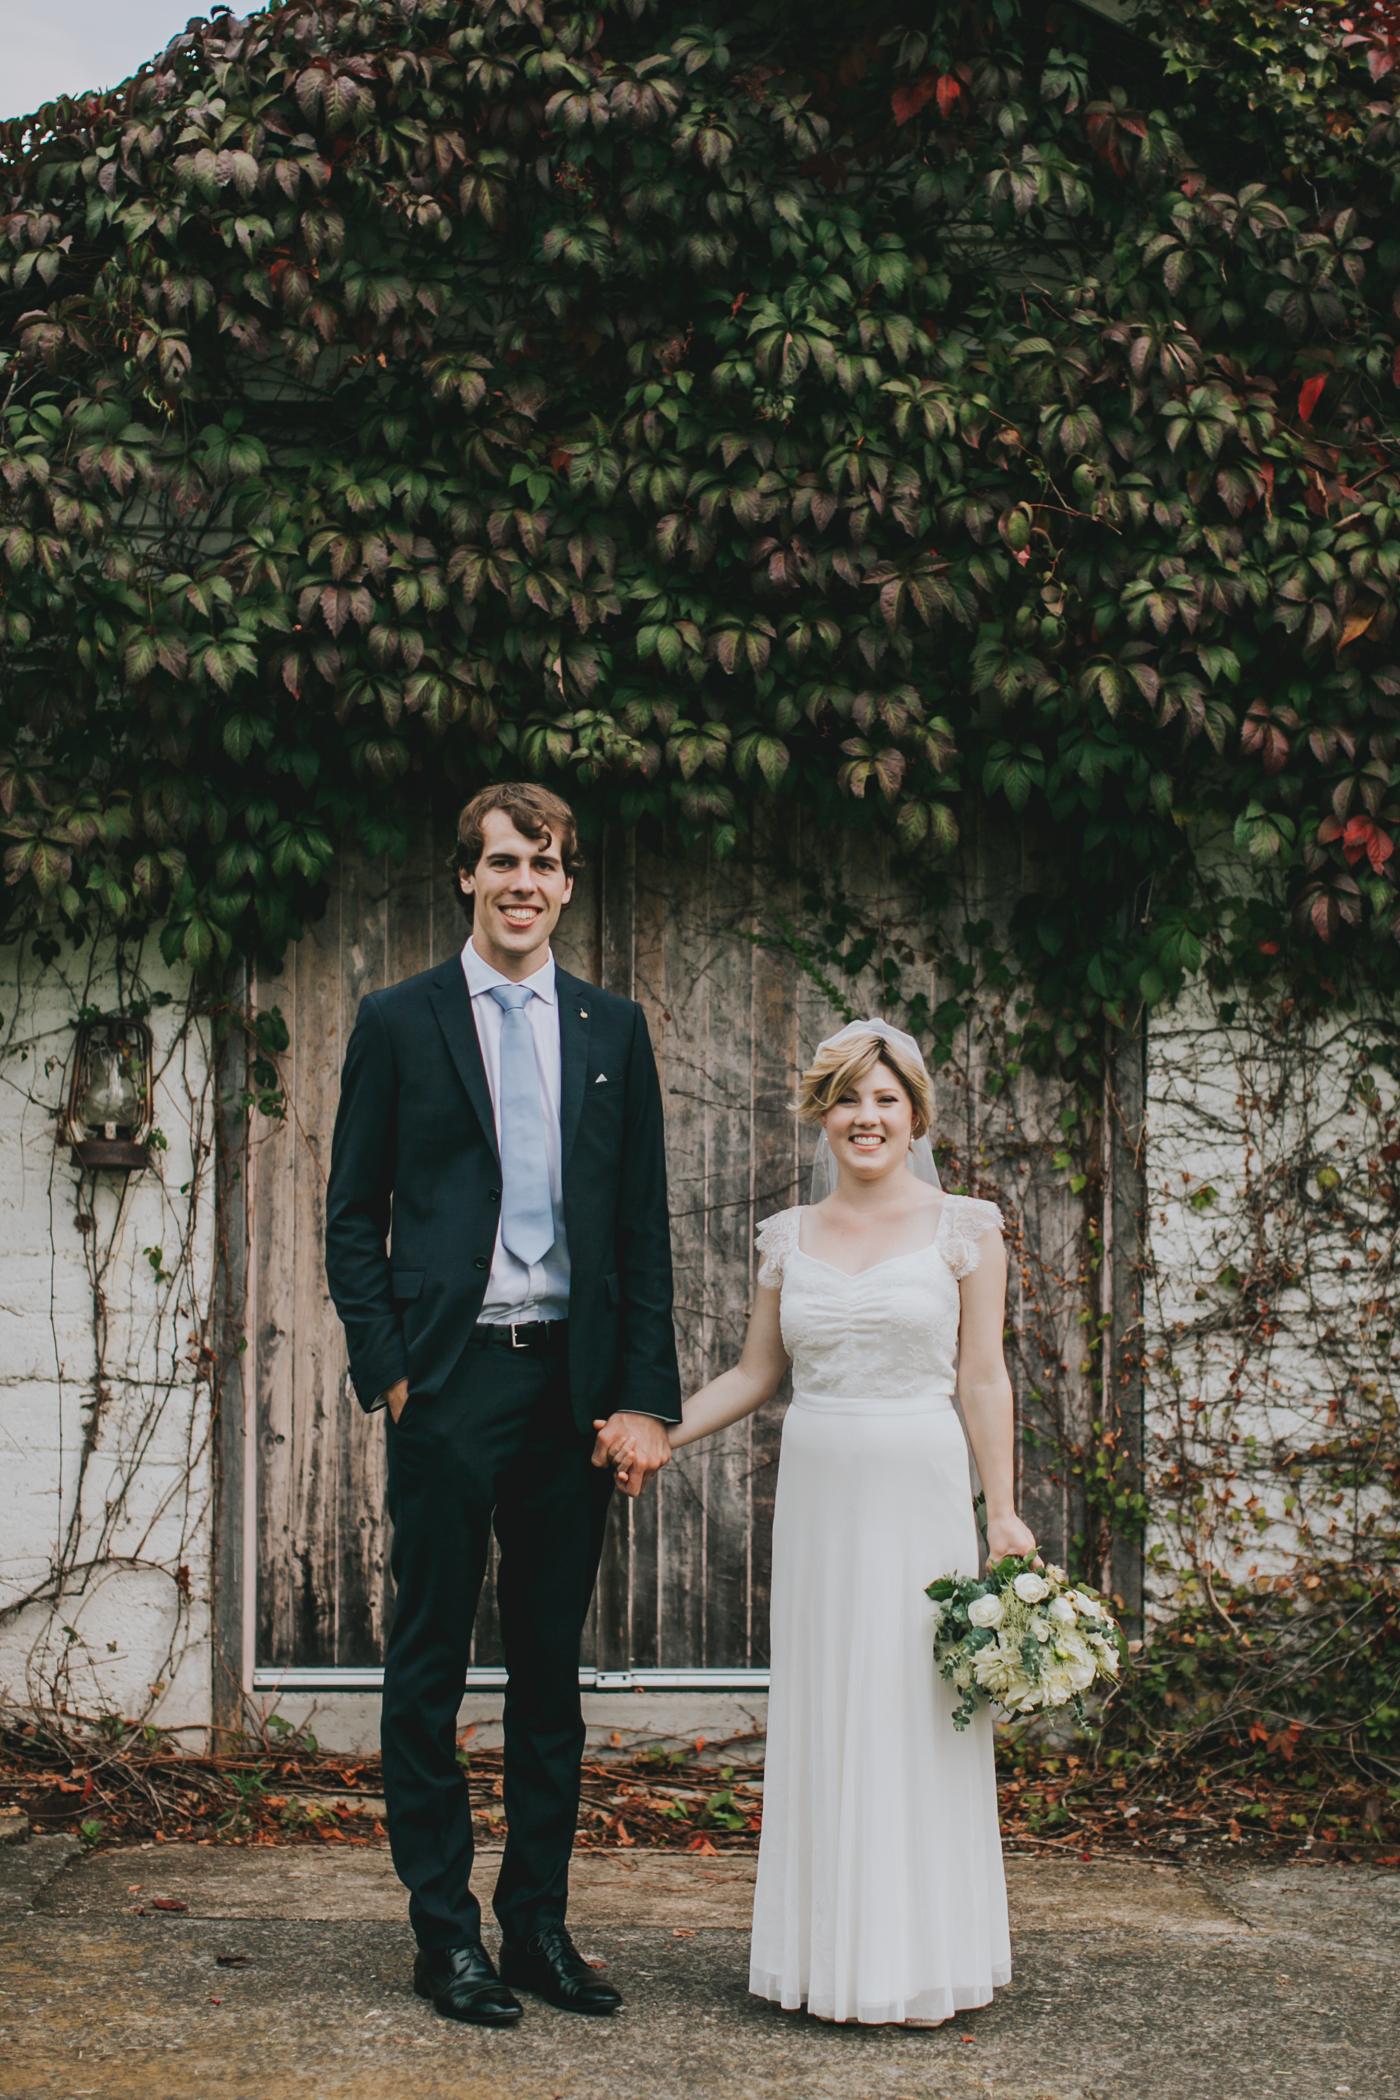 Rachel & Jacob - Willow Farm Berry - South Coast Wedding - Samantha Heather Photography-116.jpg